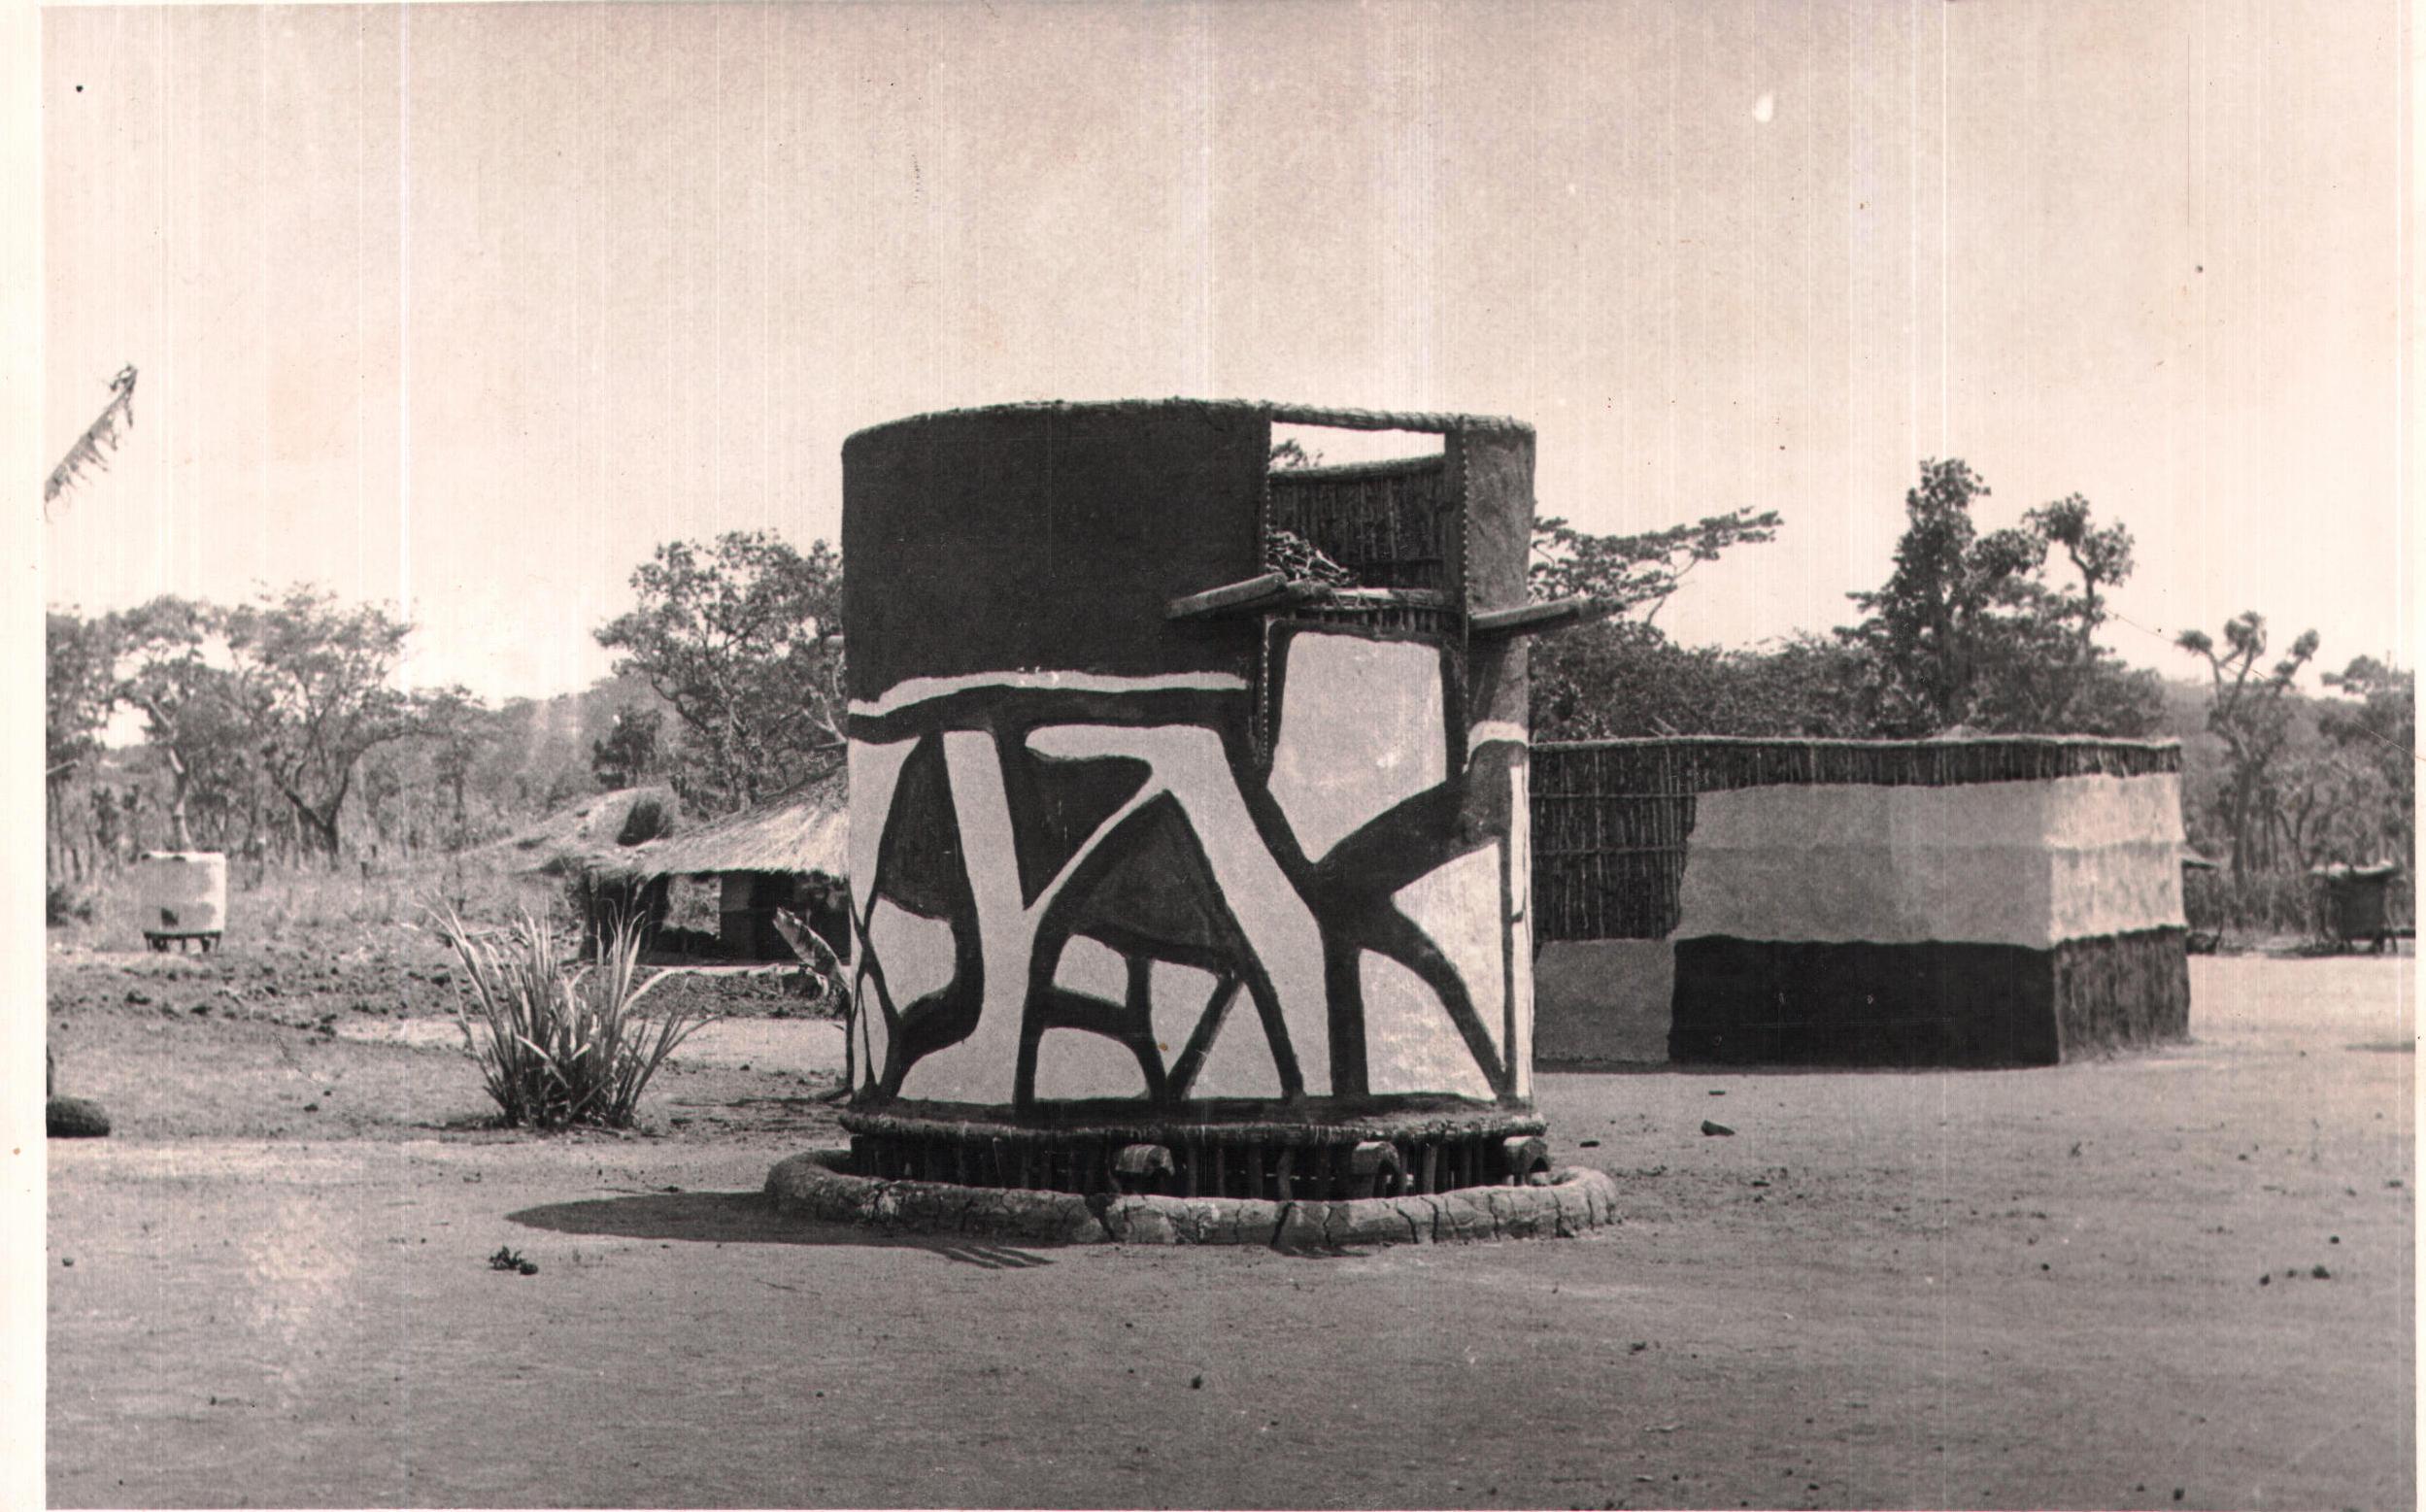 Grain containers, Graineries - Kasempa 1935-1950.jpg